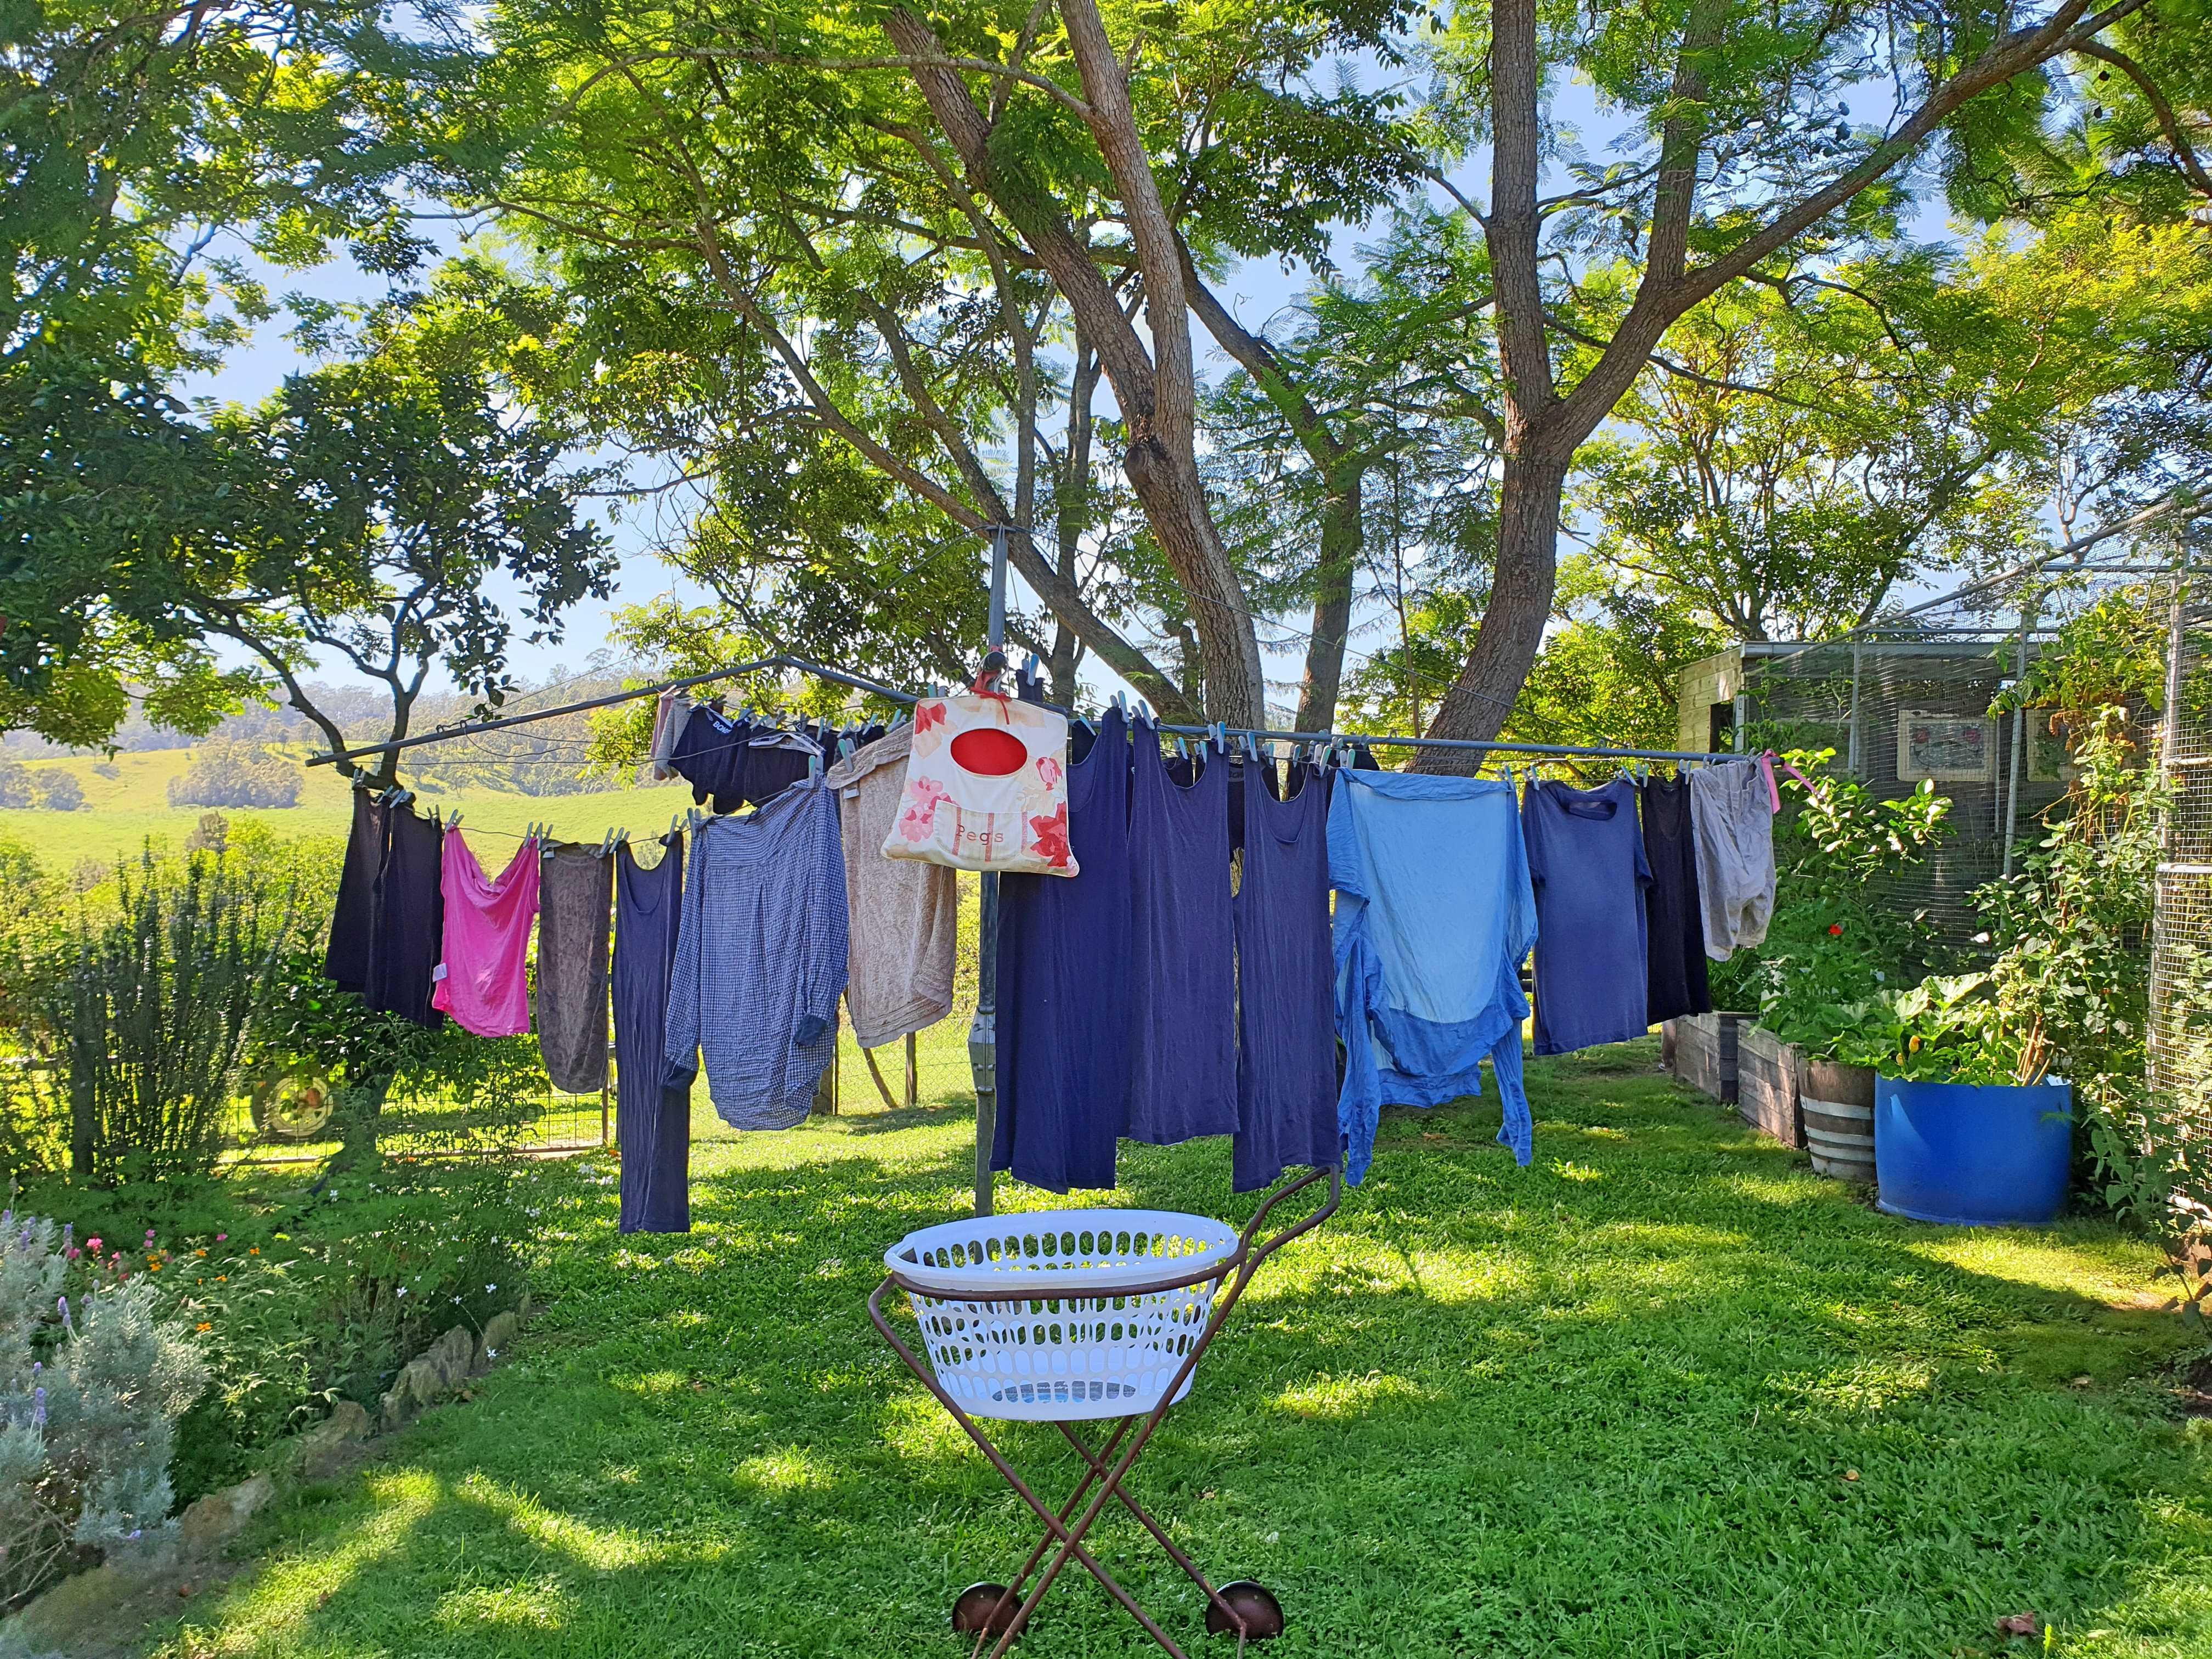 radical clothes drying apparatus